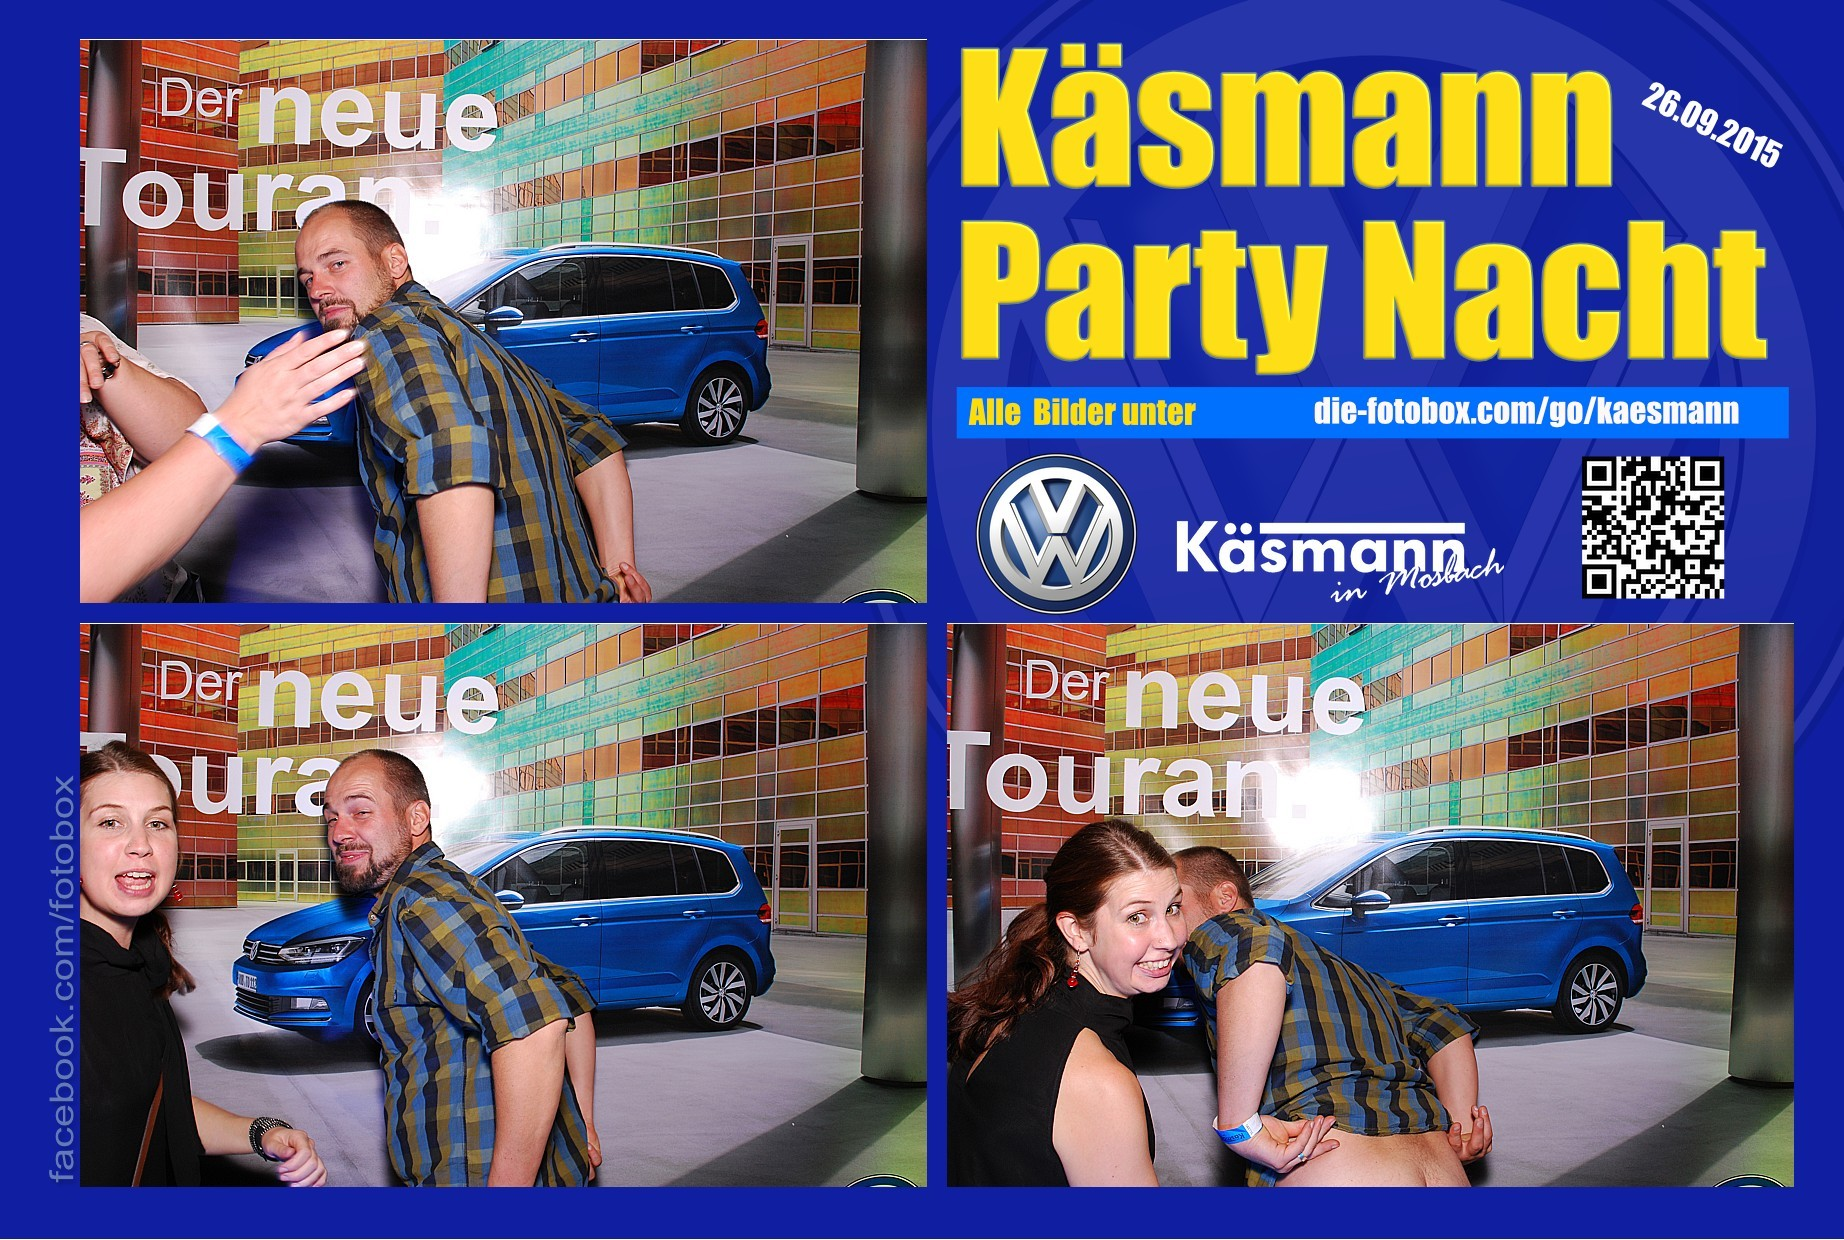 Käsmannparty 2015 - www.die-fotobox.com 00972